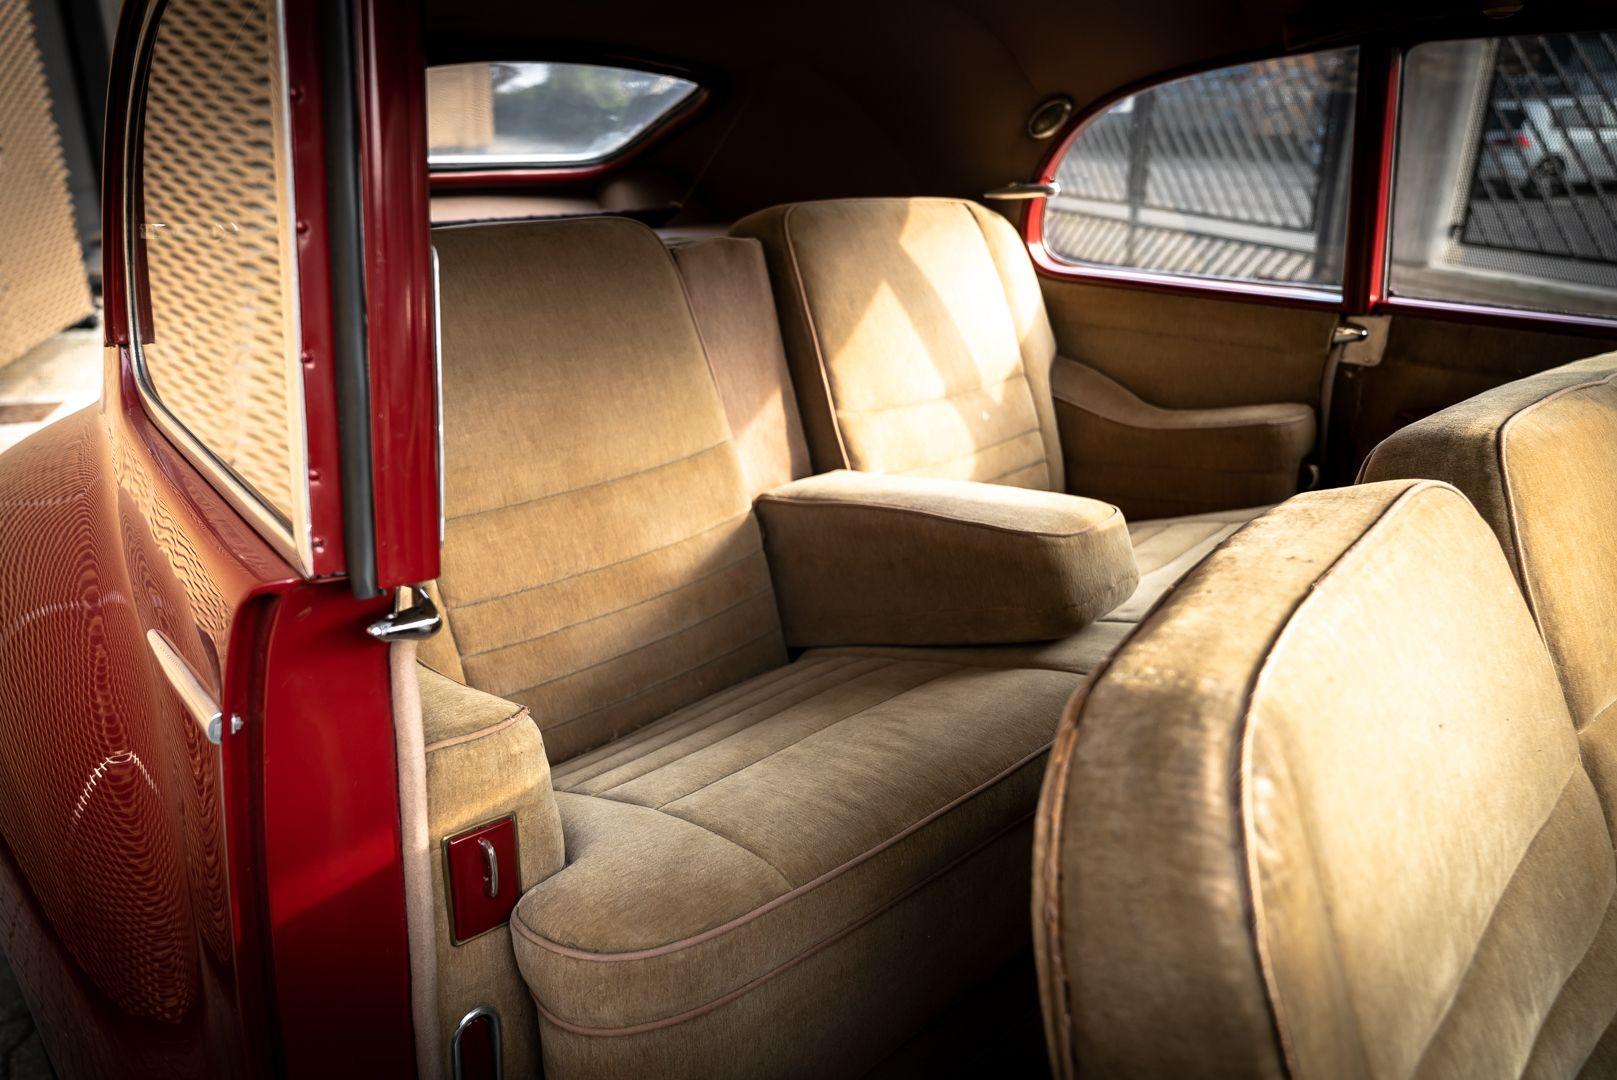 1947 Alfa Romeo Freccia d'oro 6C 2500 Sport 61732